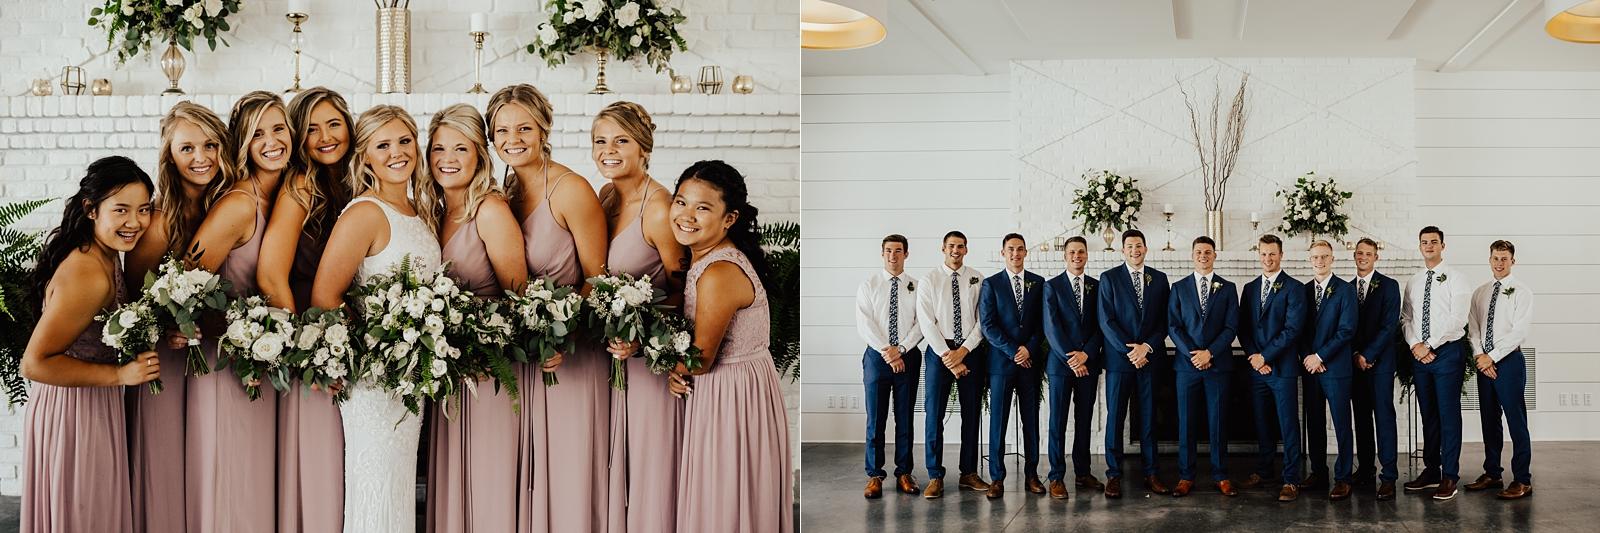 Anna & Trey Modern Minneapolis Wedding at The Hutton House_0707.jpg